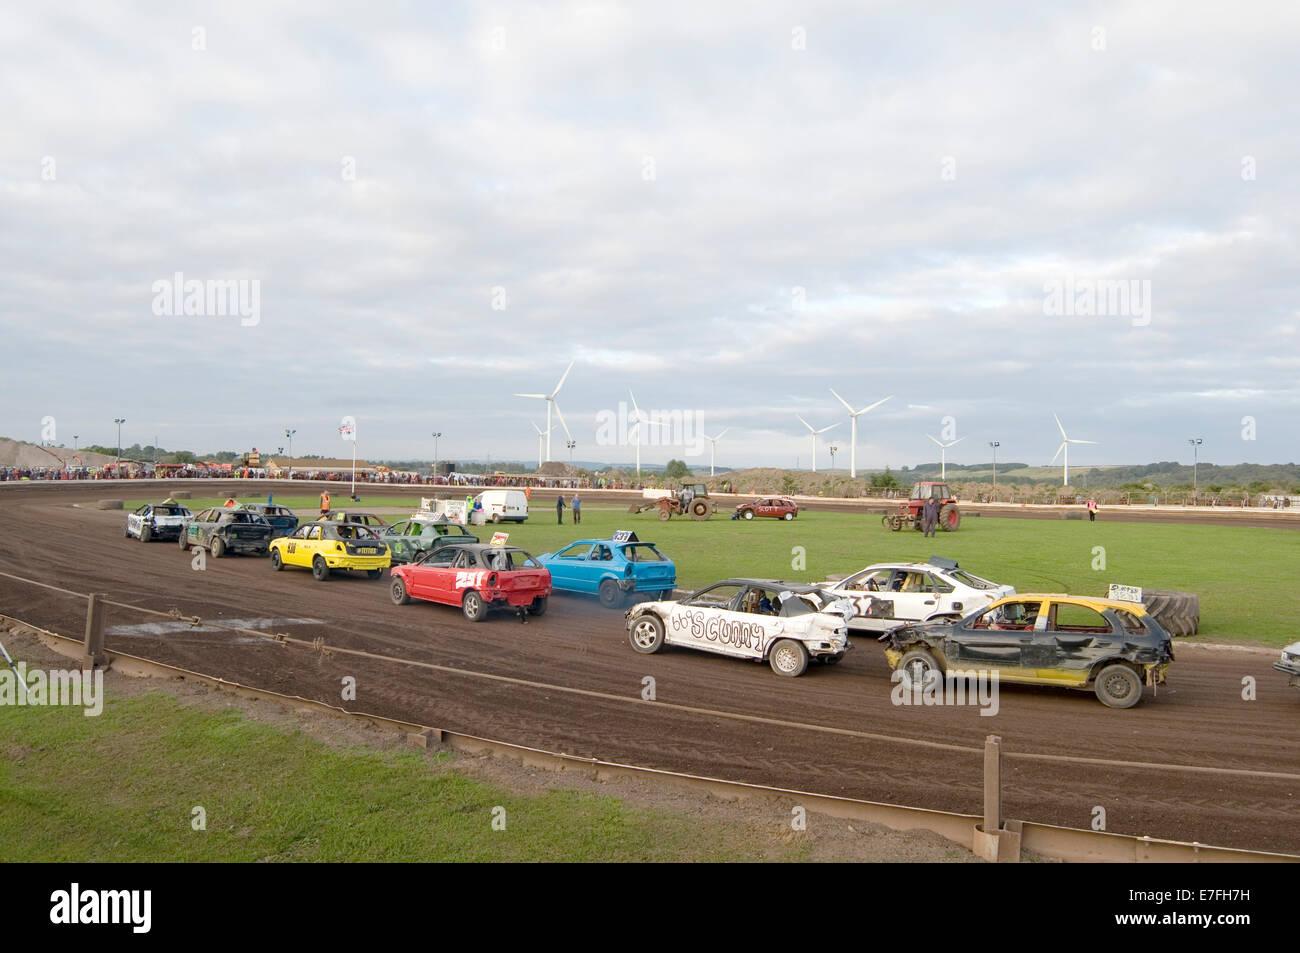 stock-car-race-races-racing-track-tracks-banger-old-car-cars-demolition-E7FH7H.jpg